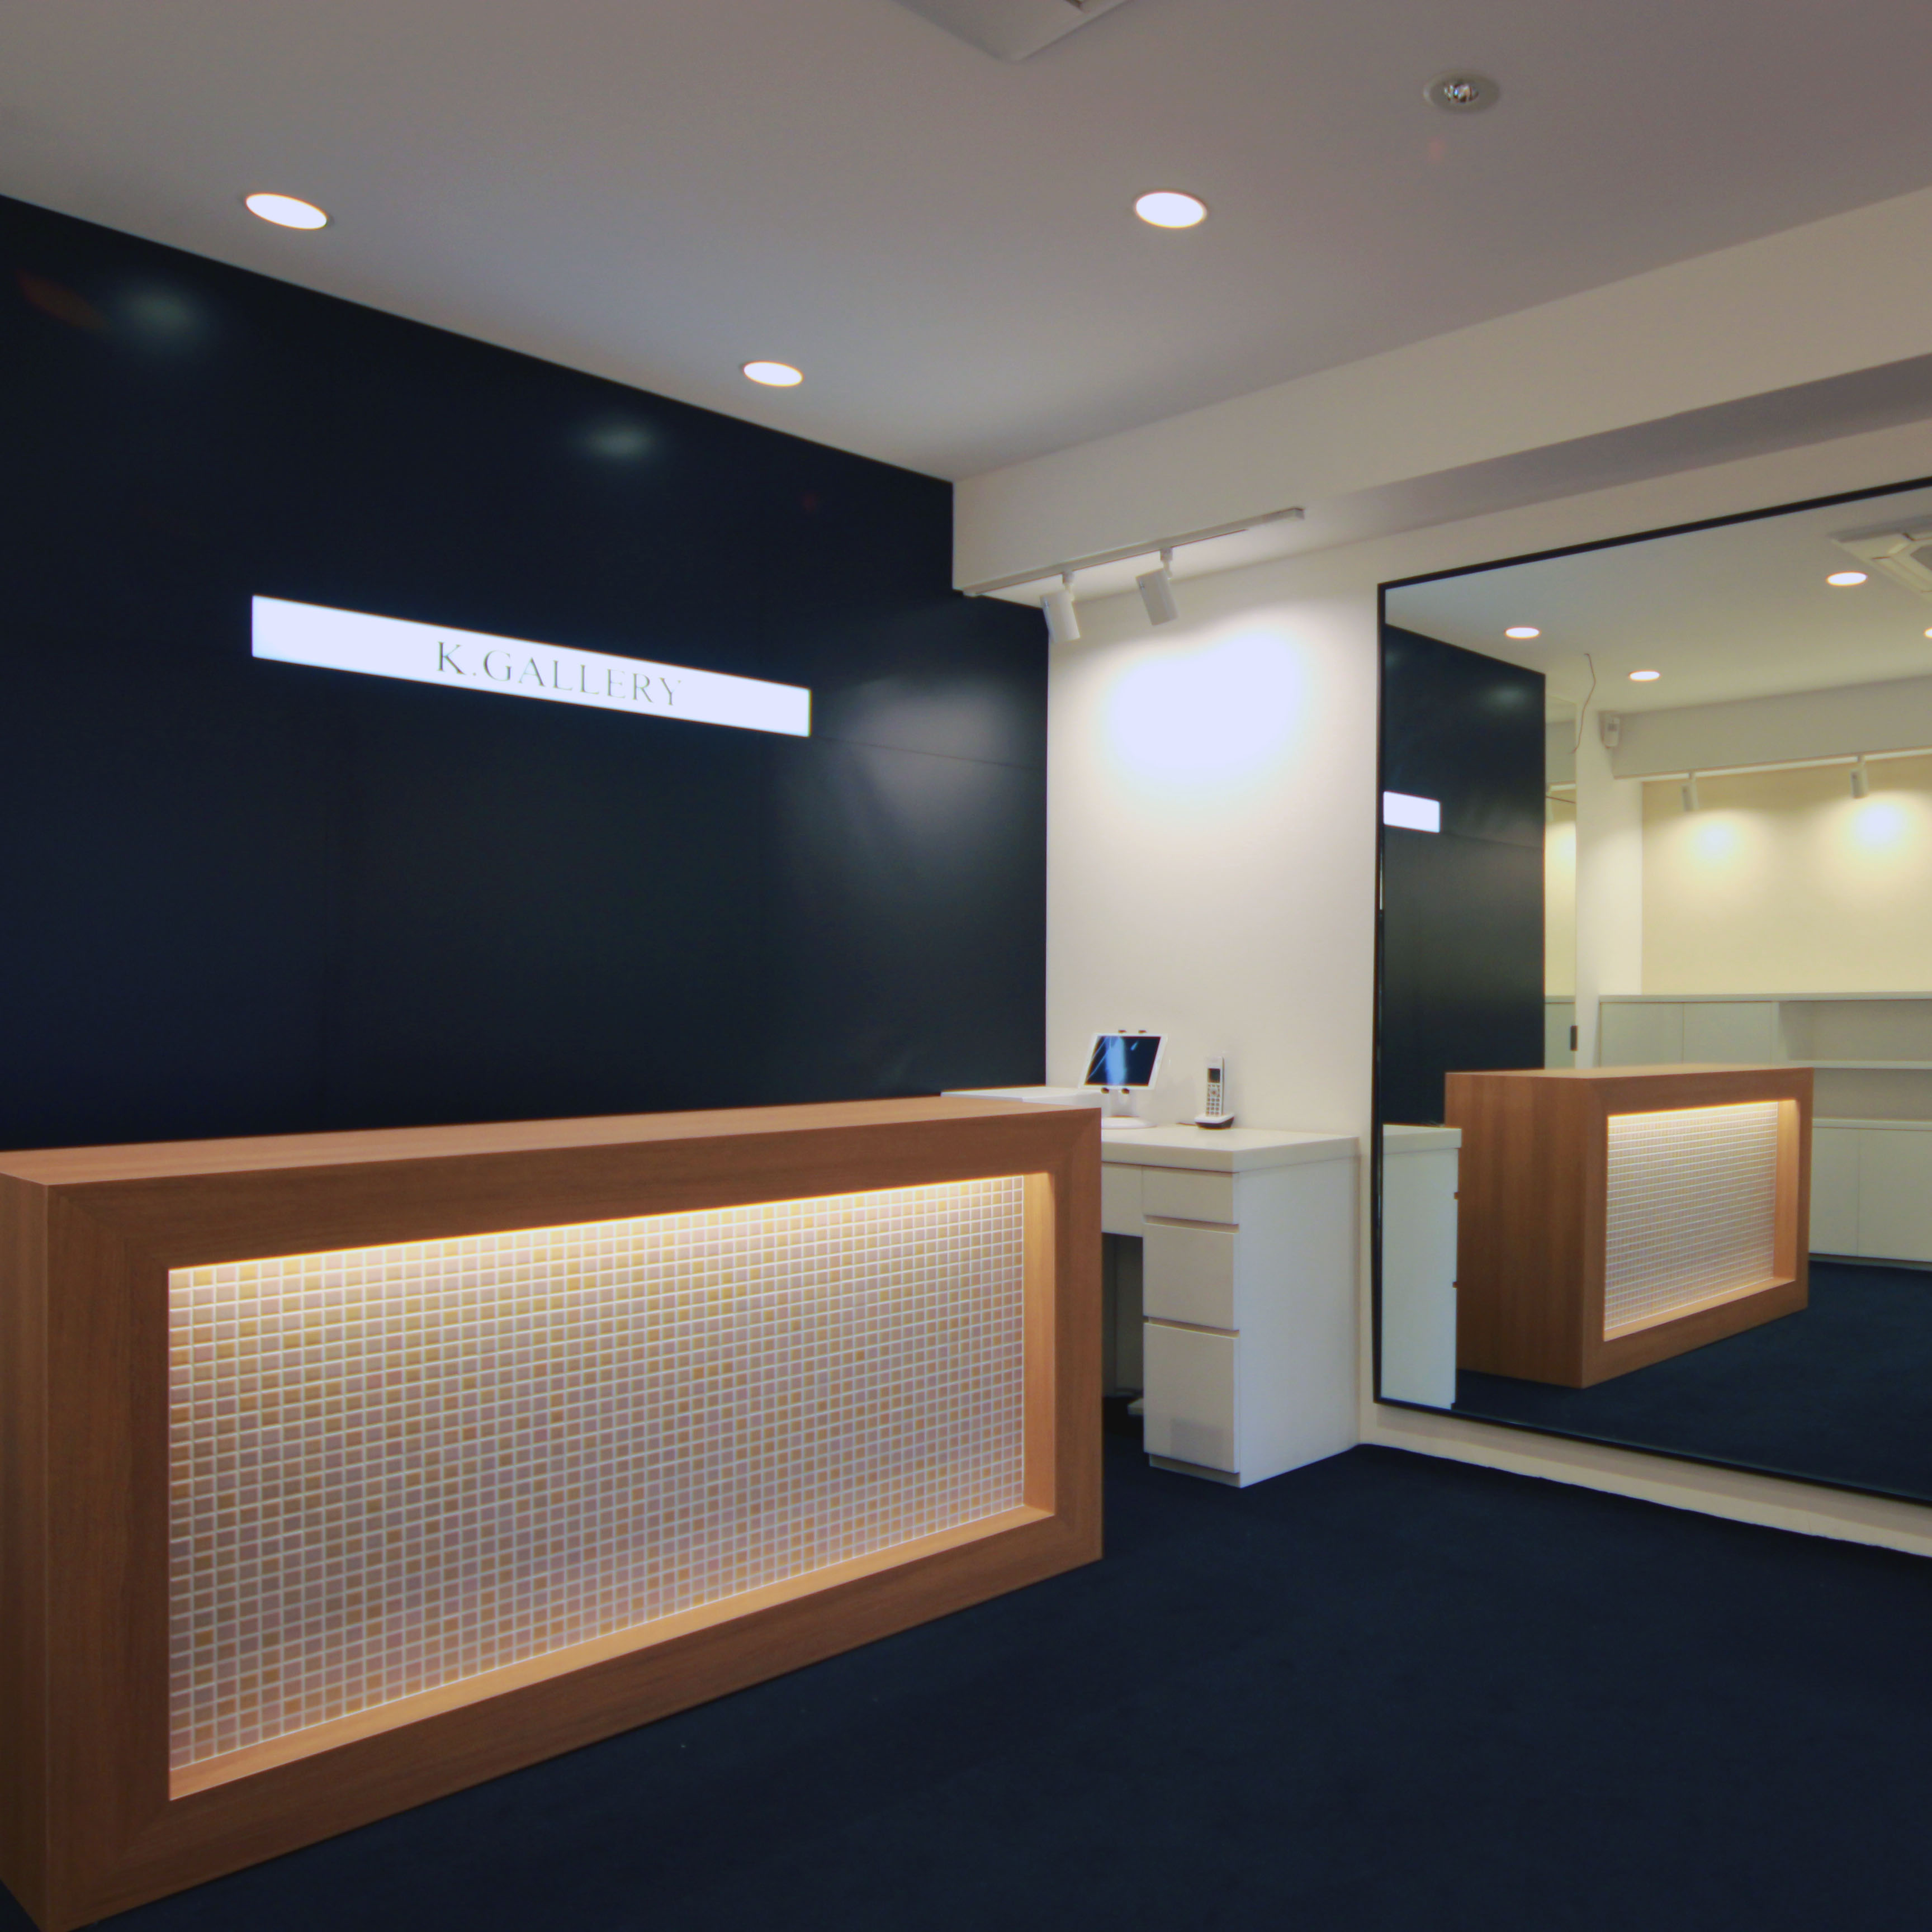 kamioka直営店 K-Gallery 外苑前